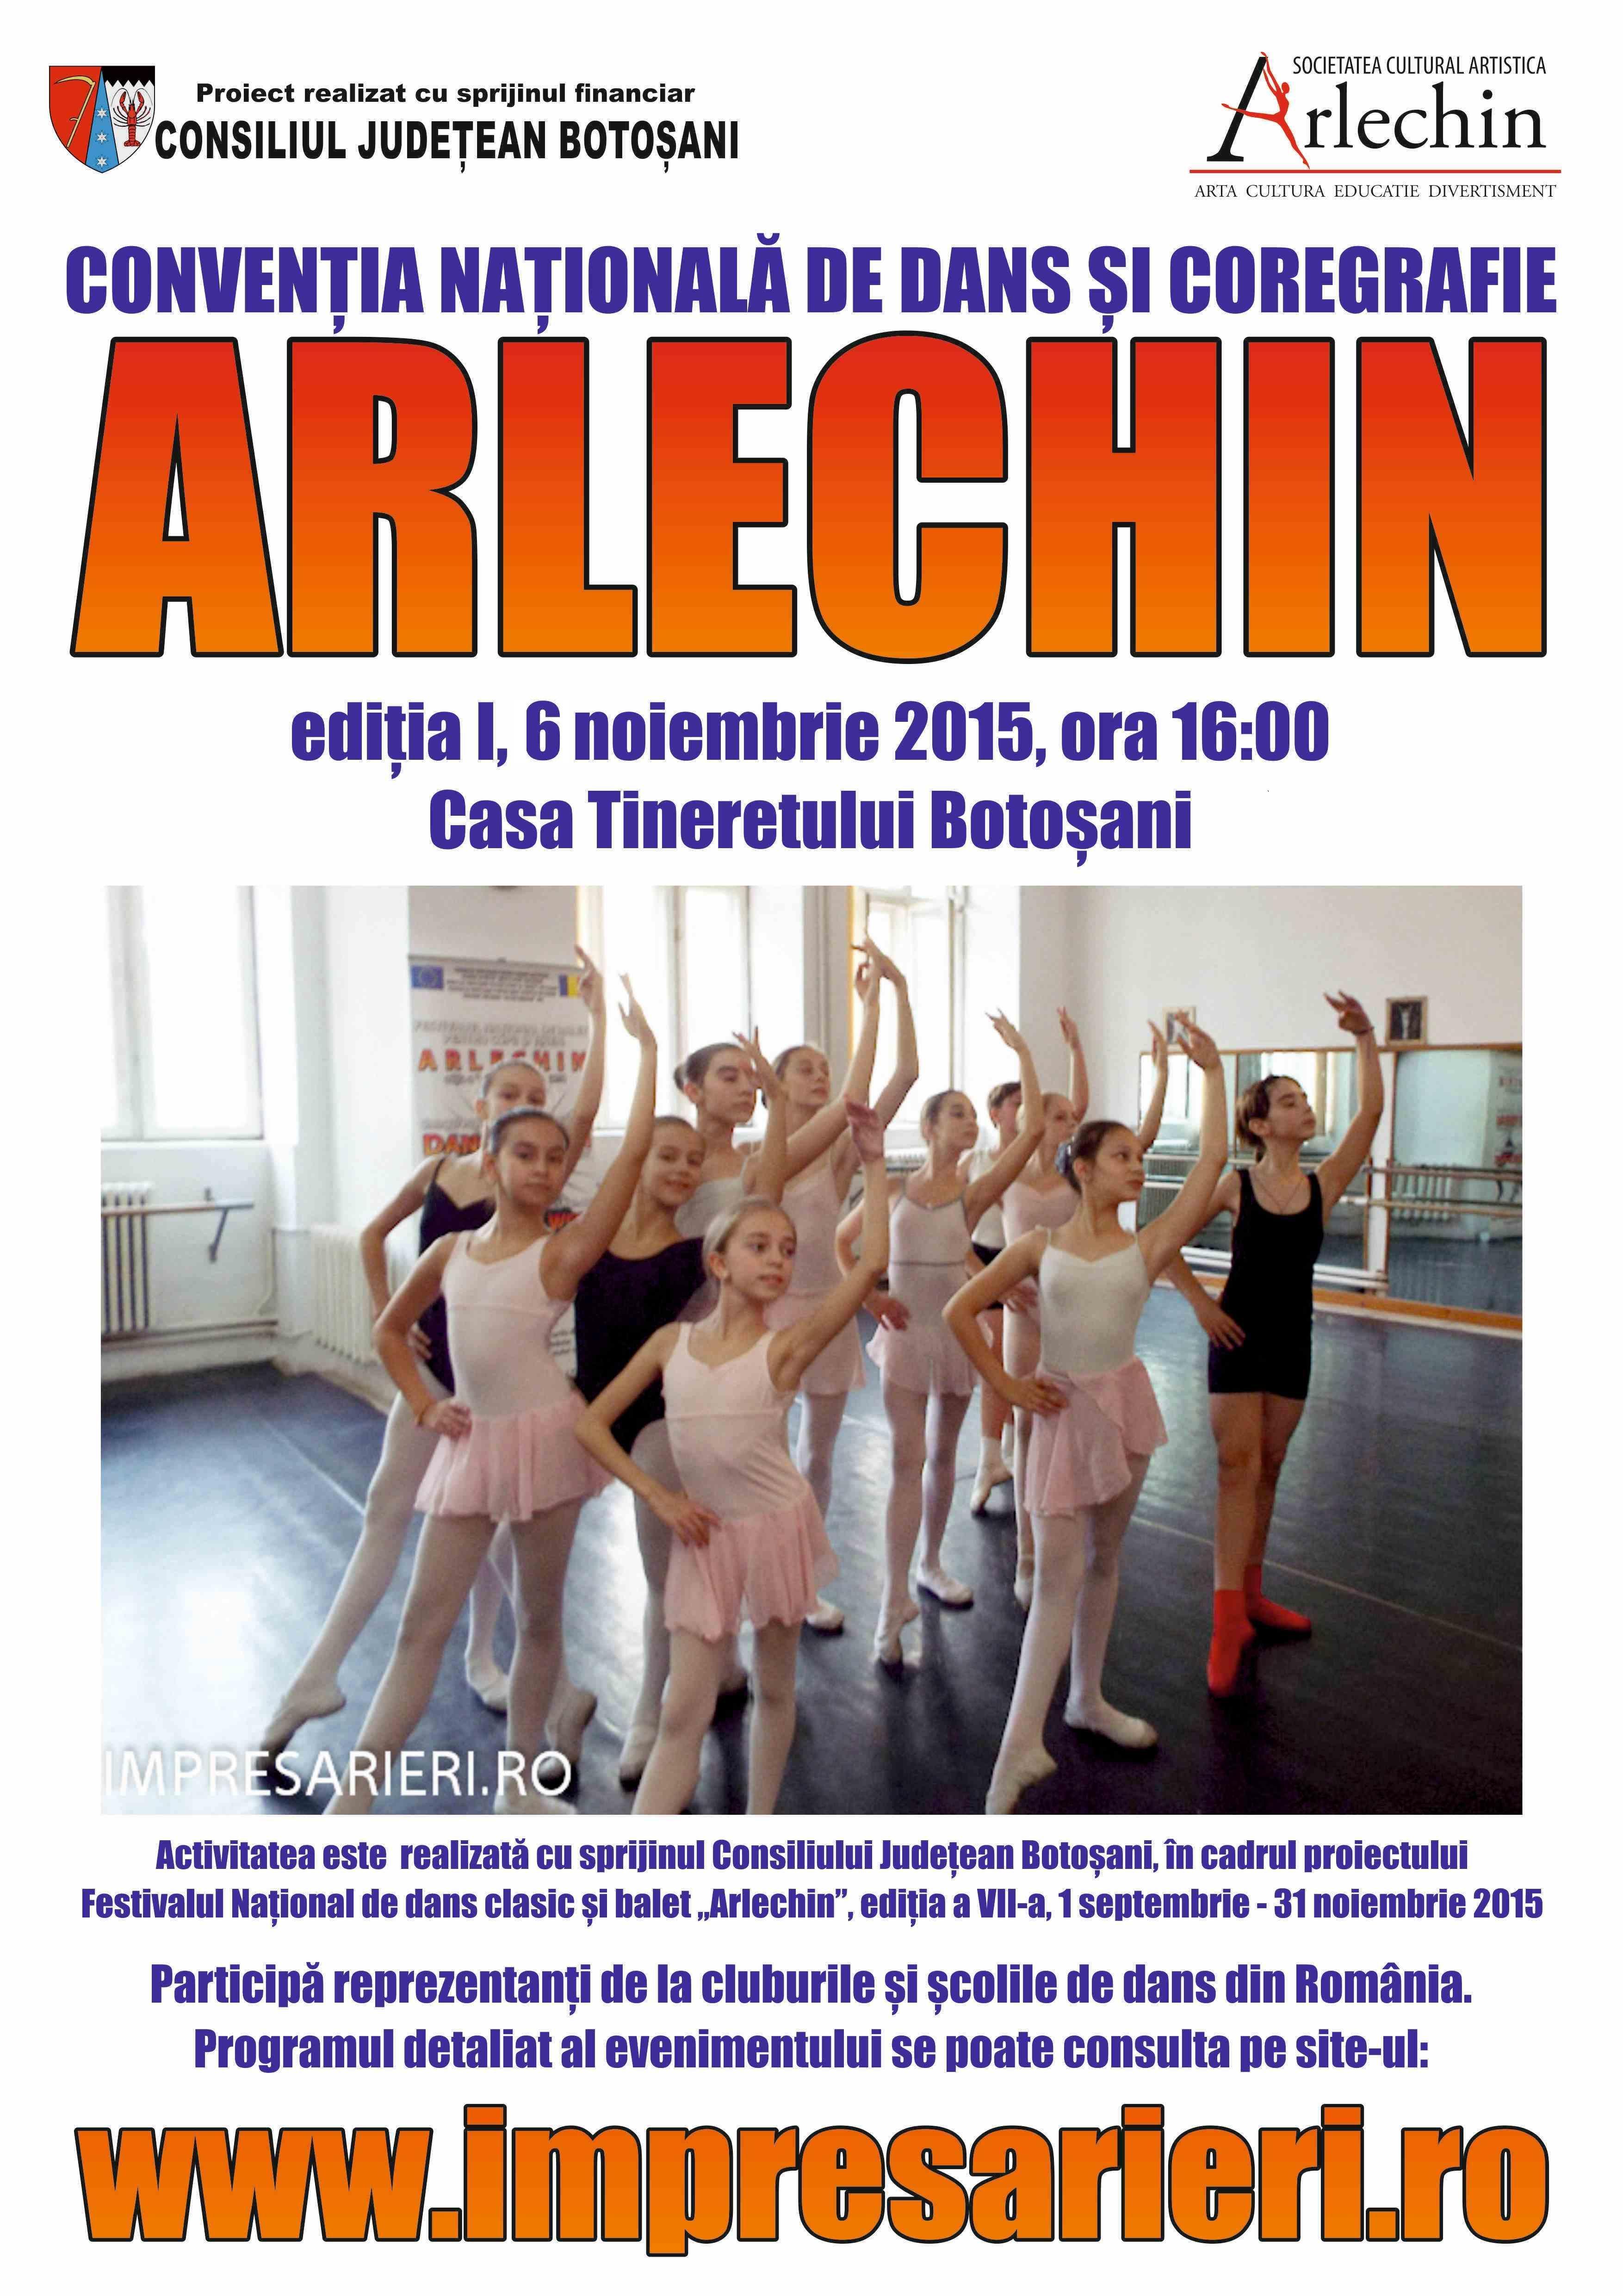 Conventia Nationala de dans si coregrafie ARLECHIN - 6 noiembrie 2015